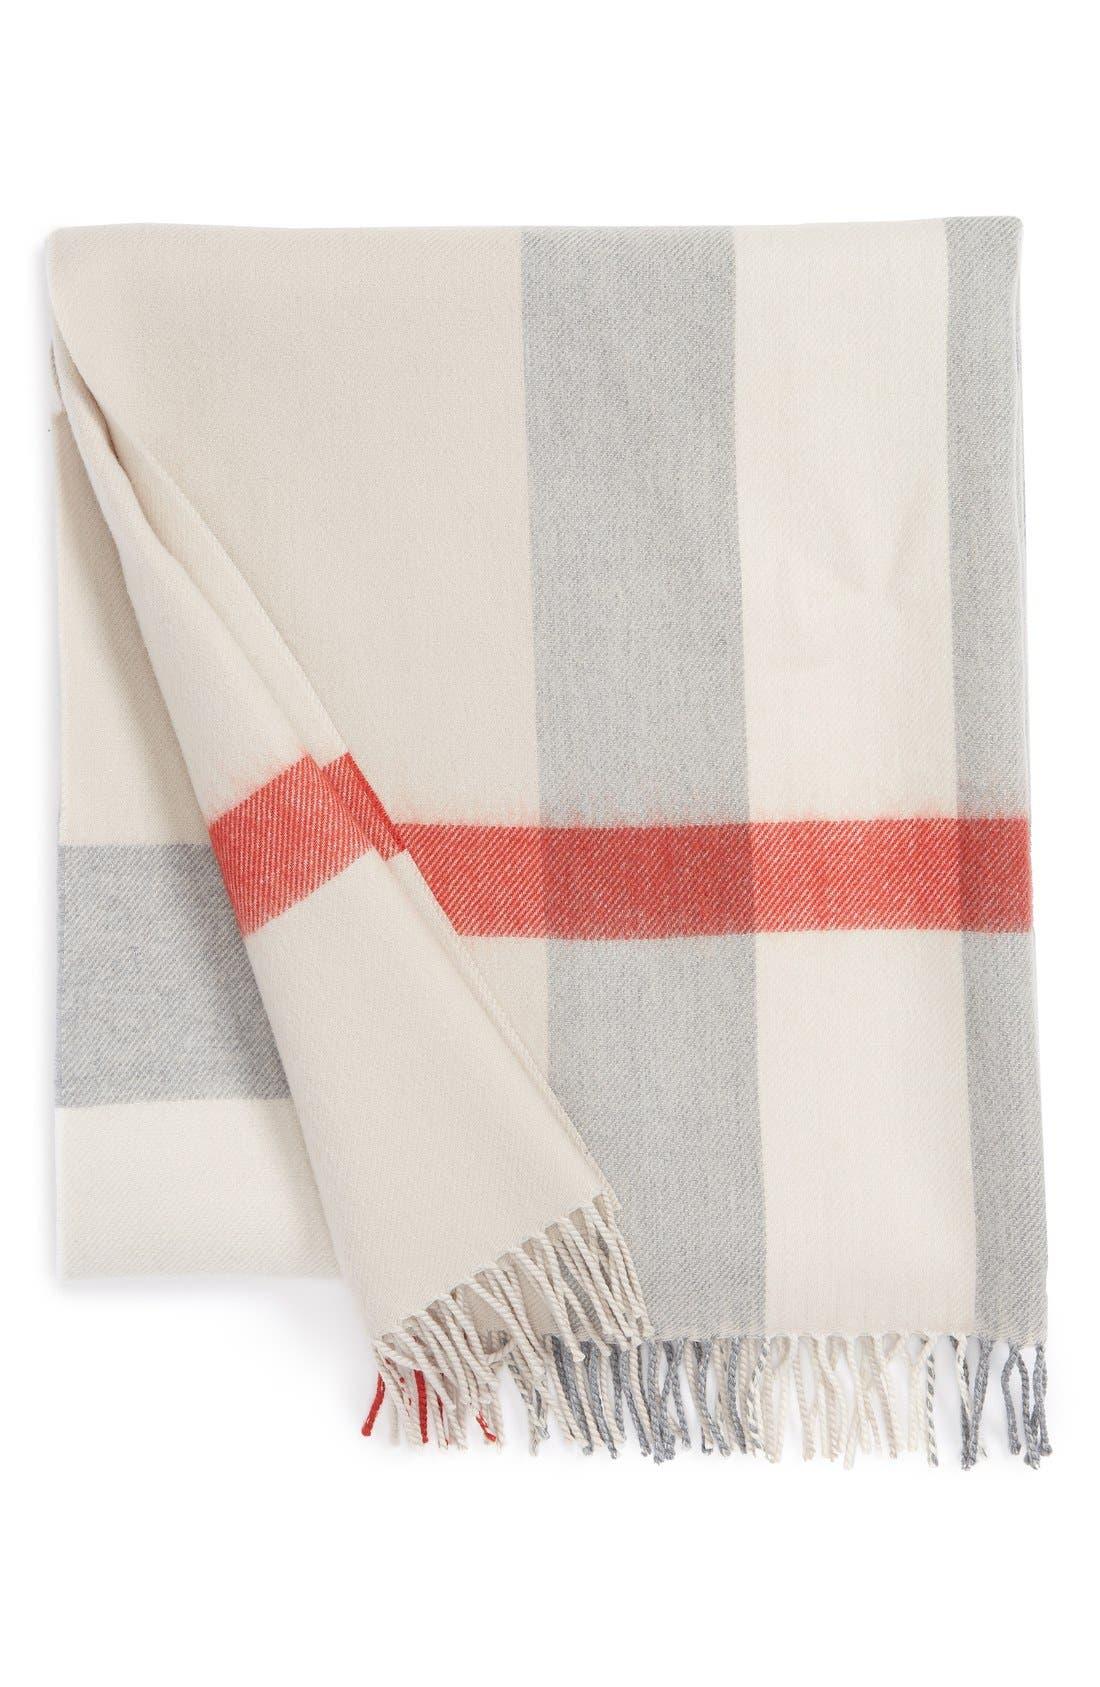 Merino Wool Baby Blanket,                         Main,                         color, Heritage Stone